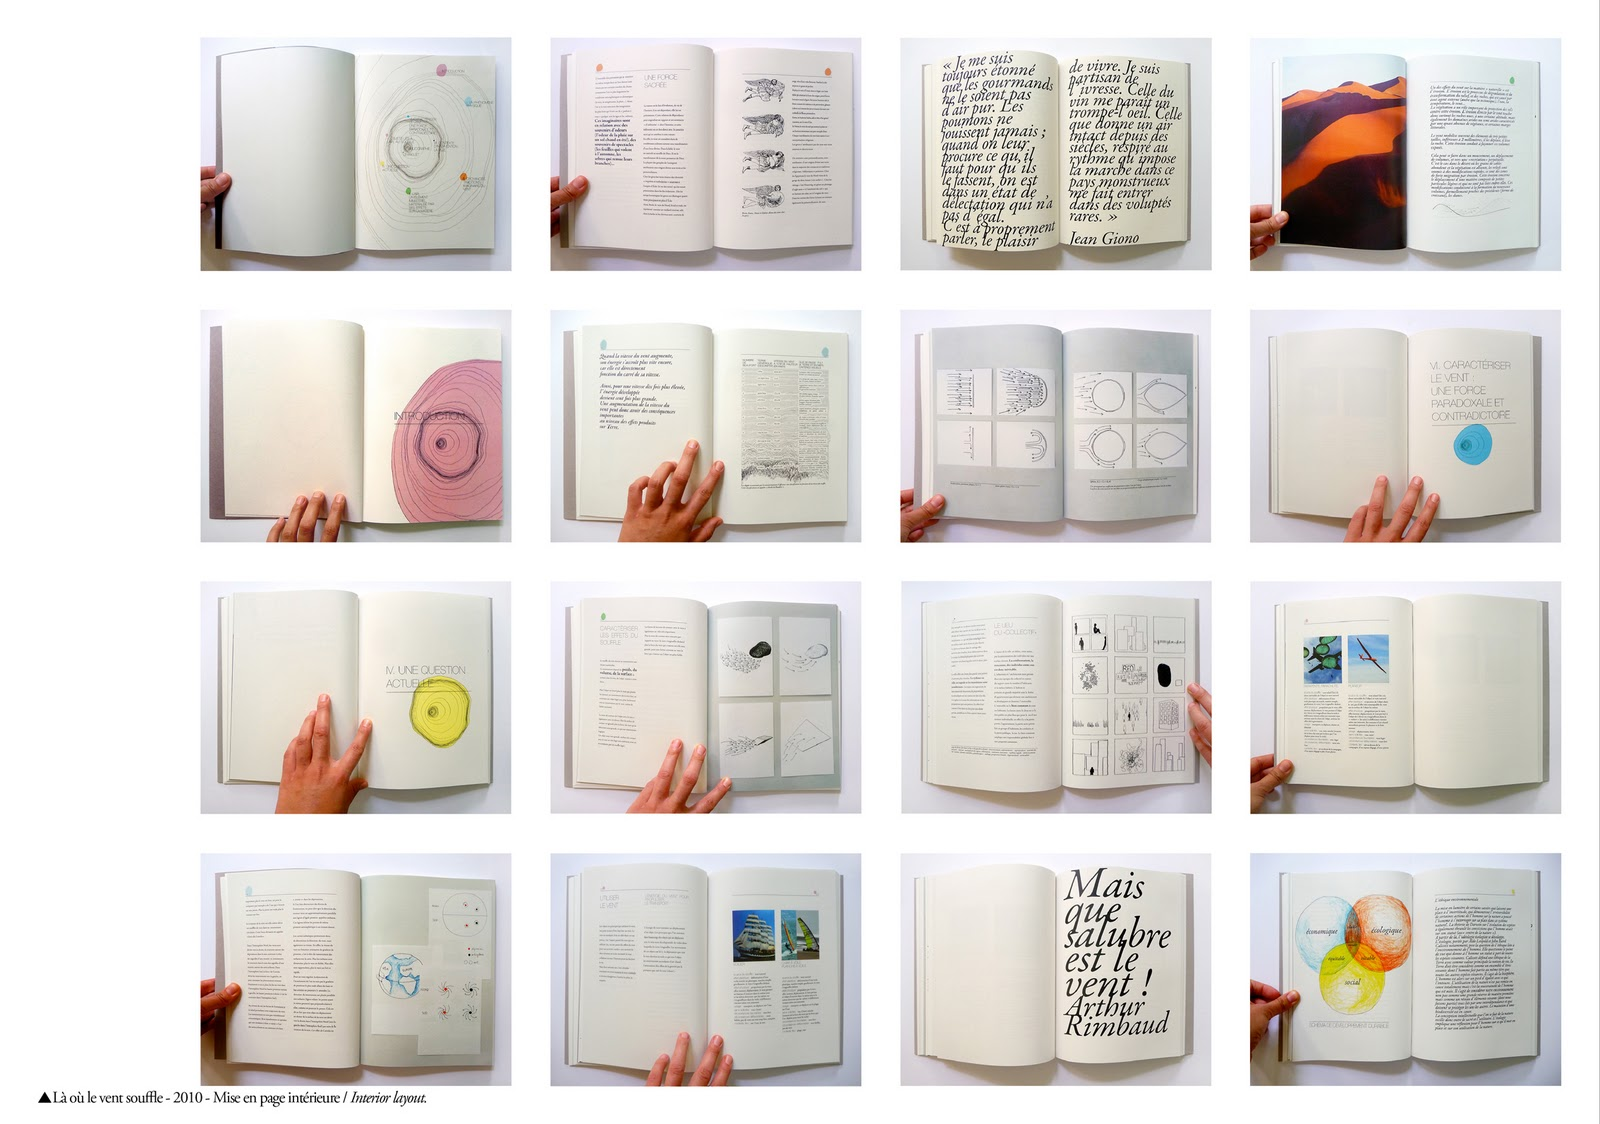 Berühmt Regardez / Look: /// Mise en page / Editing XX52